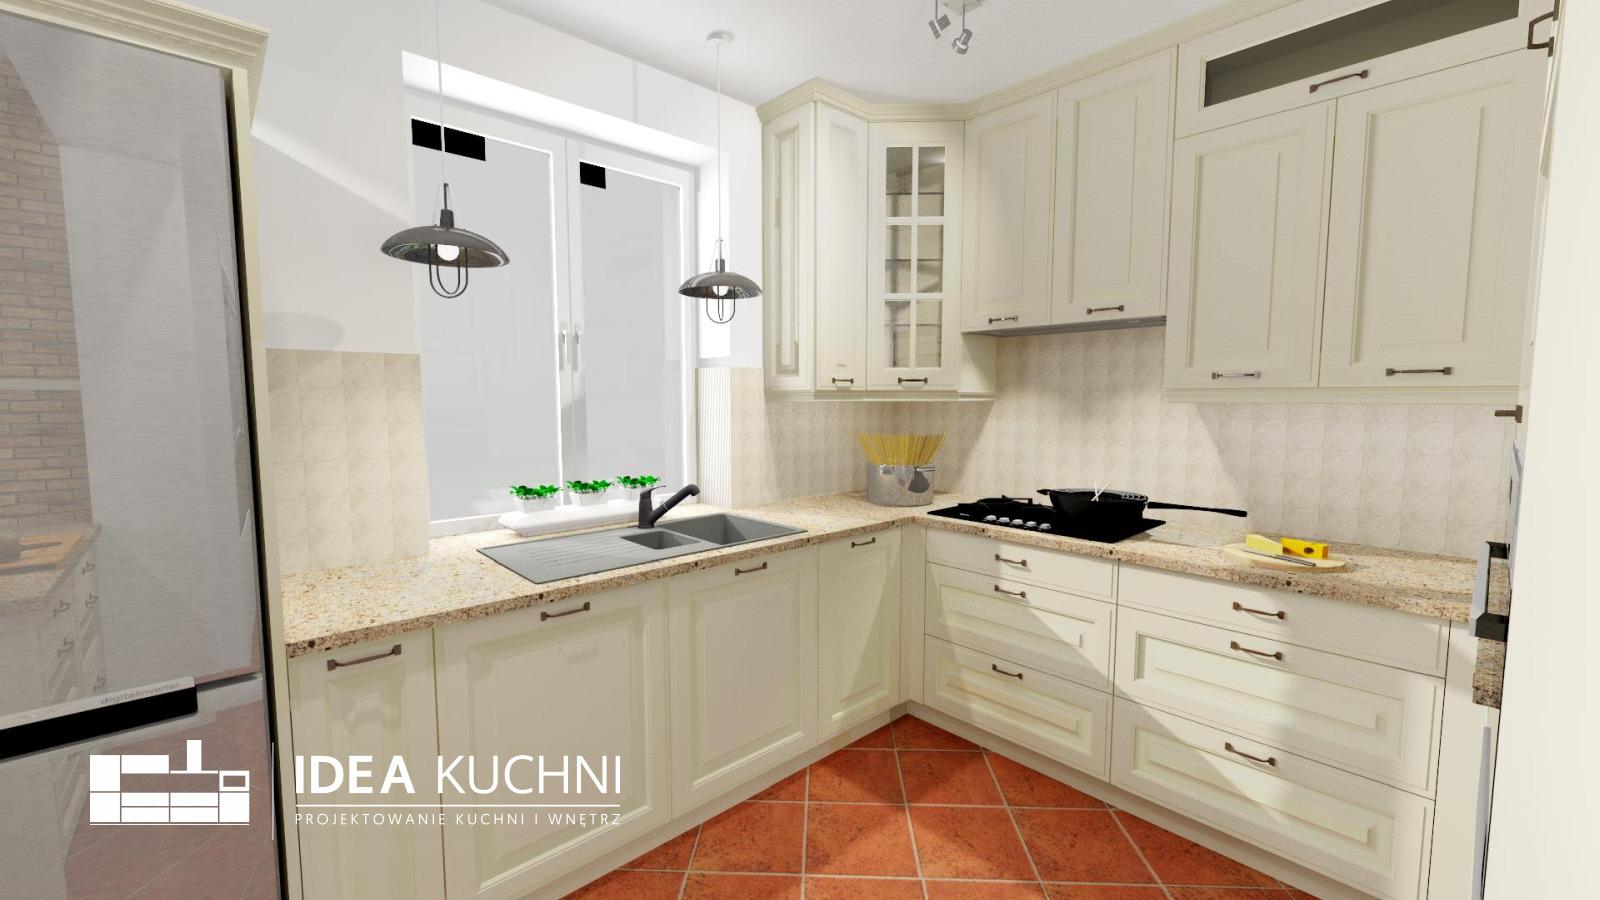 kuchnia-marki-kuchnia-klasyczna-www.ideakuchni.pl